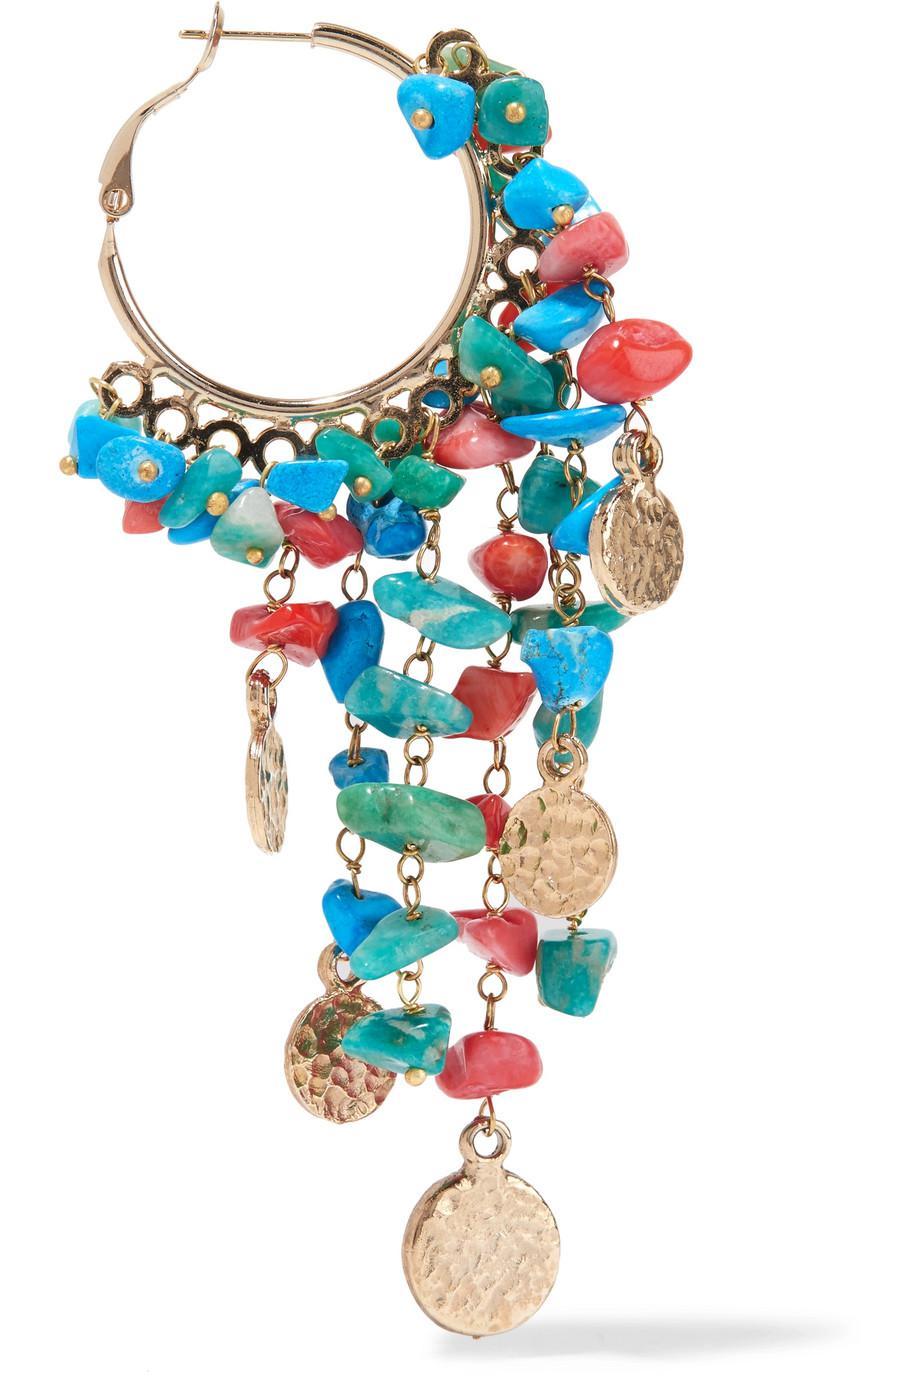 Rosantica Vento Gold-tone Beaded Hoop Earrings - Blue vQCz5yEgJ